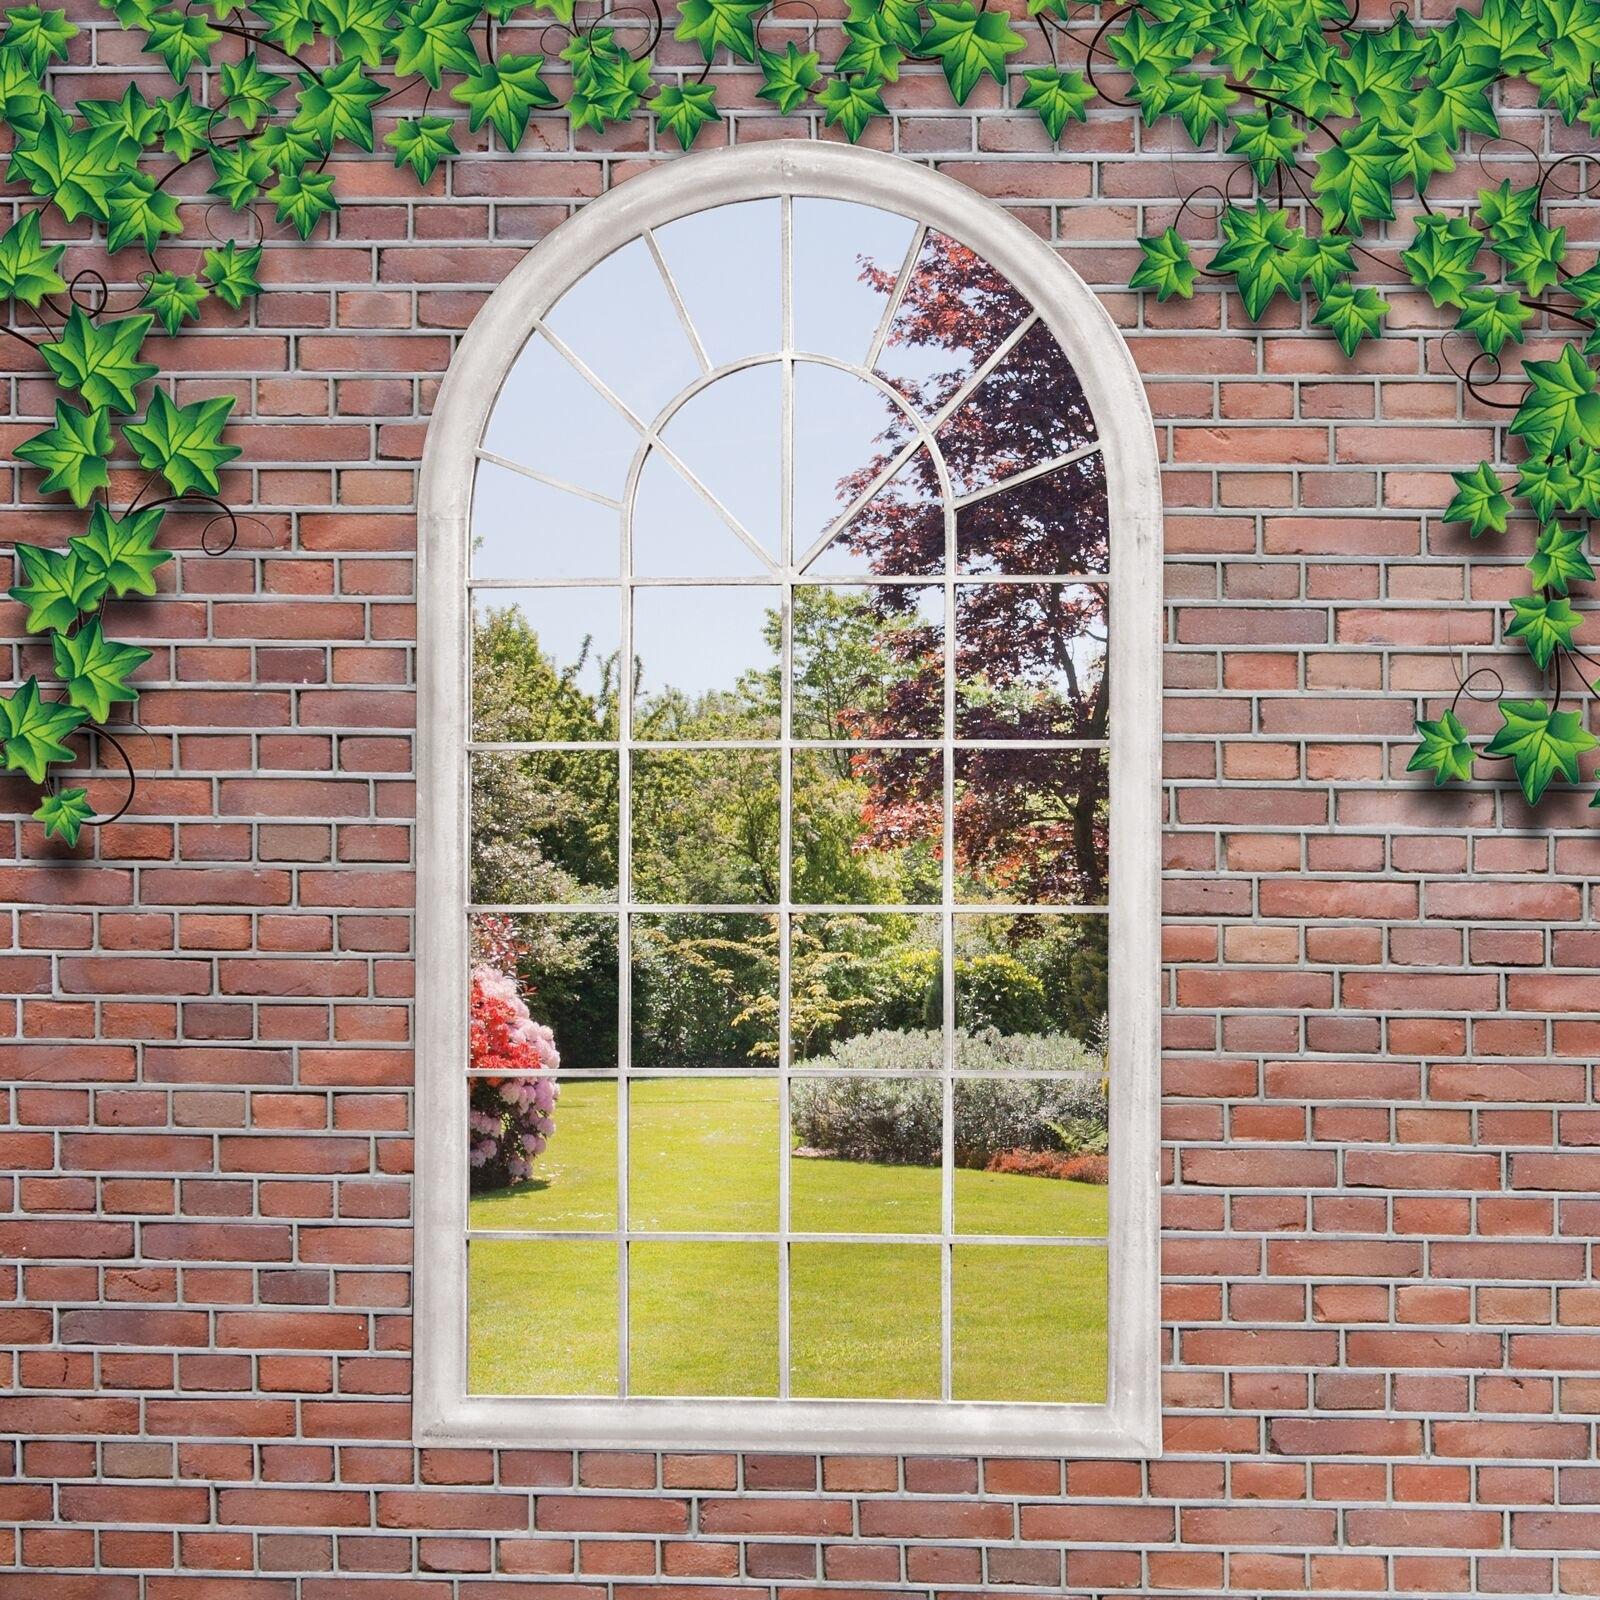 Suntime Outdoor Living Garden Window Mirror Wall Decor Reviews Within Garden Window Mirror (Image 14 of 15)